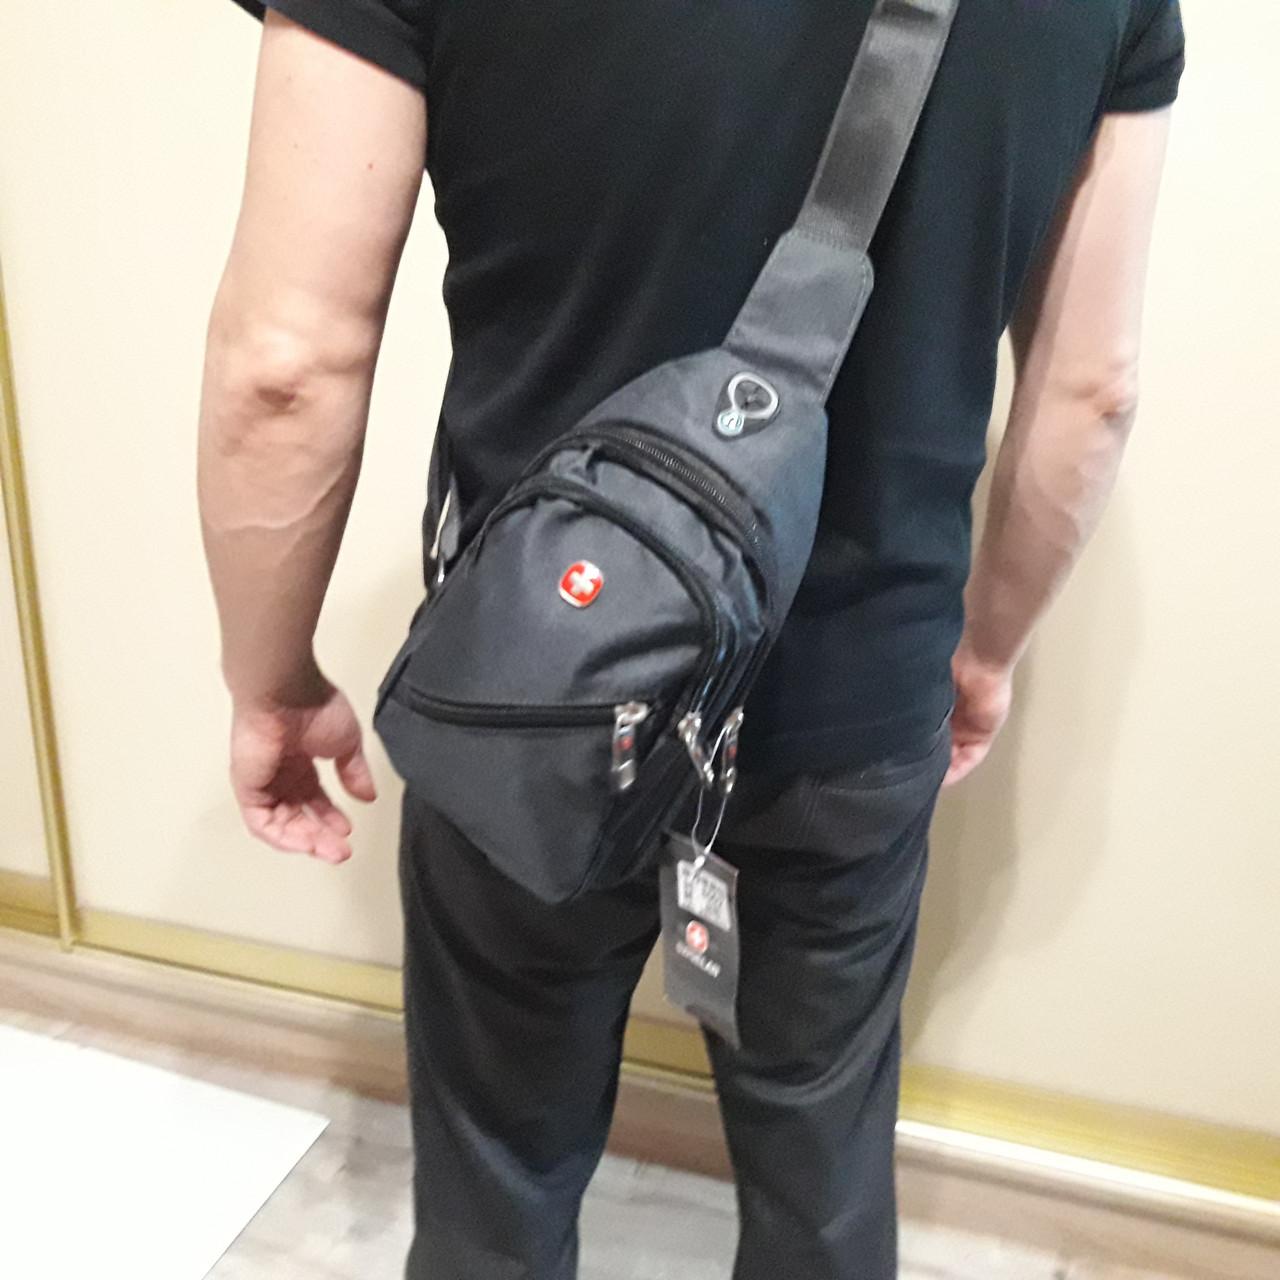 Рюкзак на одно плечо Swissgear мини синий серый черный